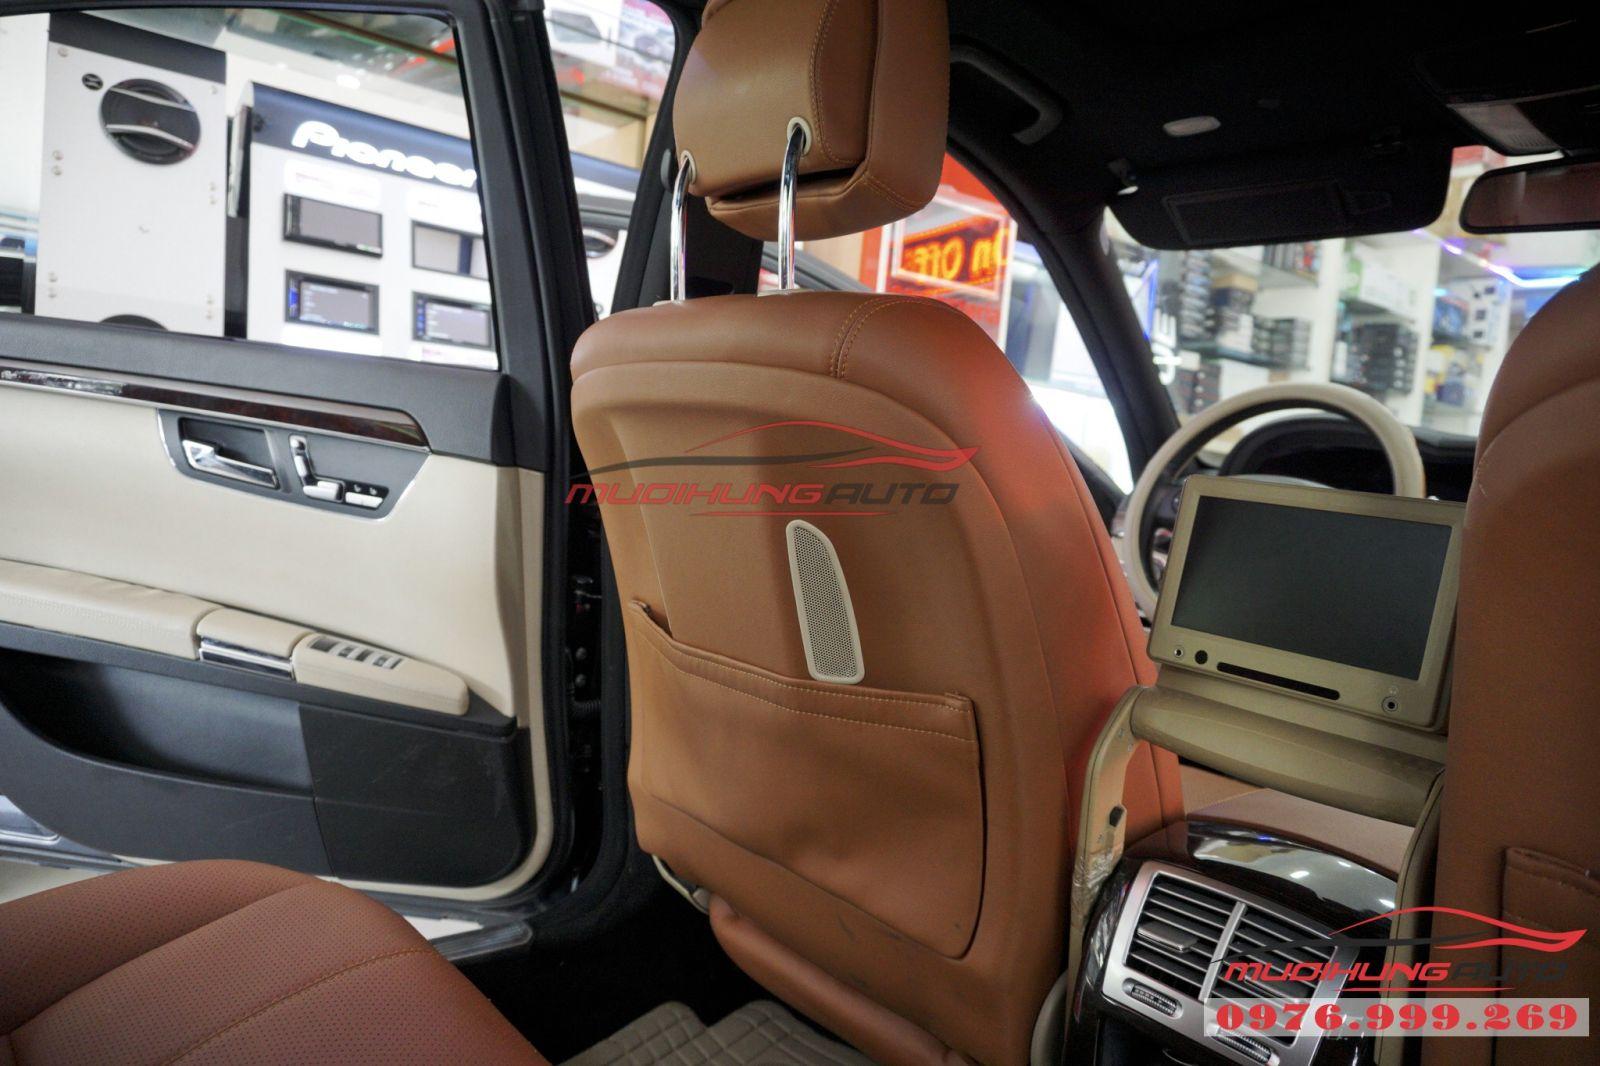 Bọc ghế da cao cấp cho Mercedes Benz giá tốt 04